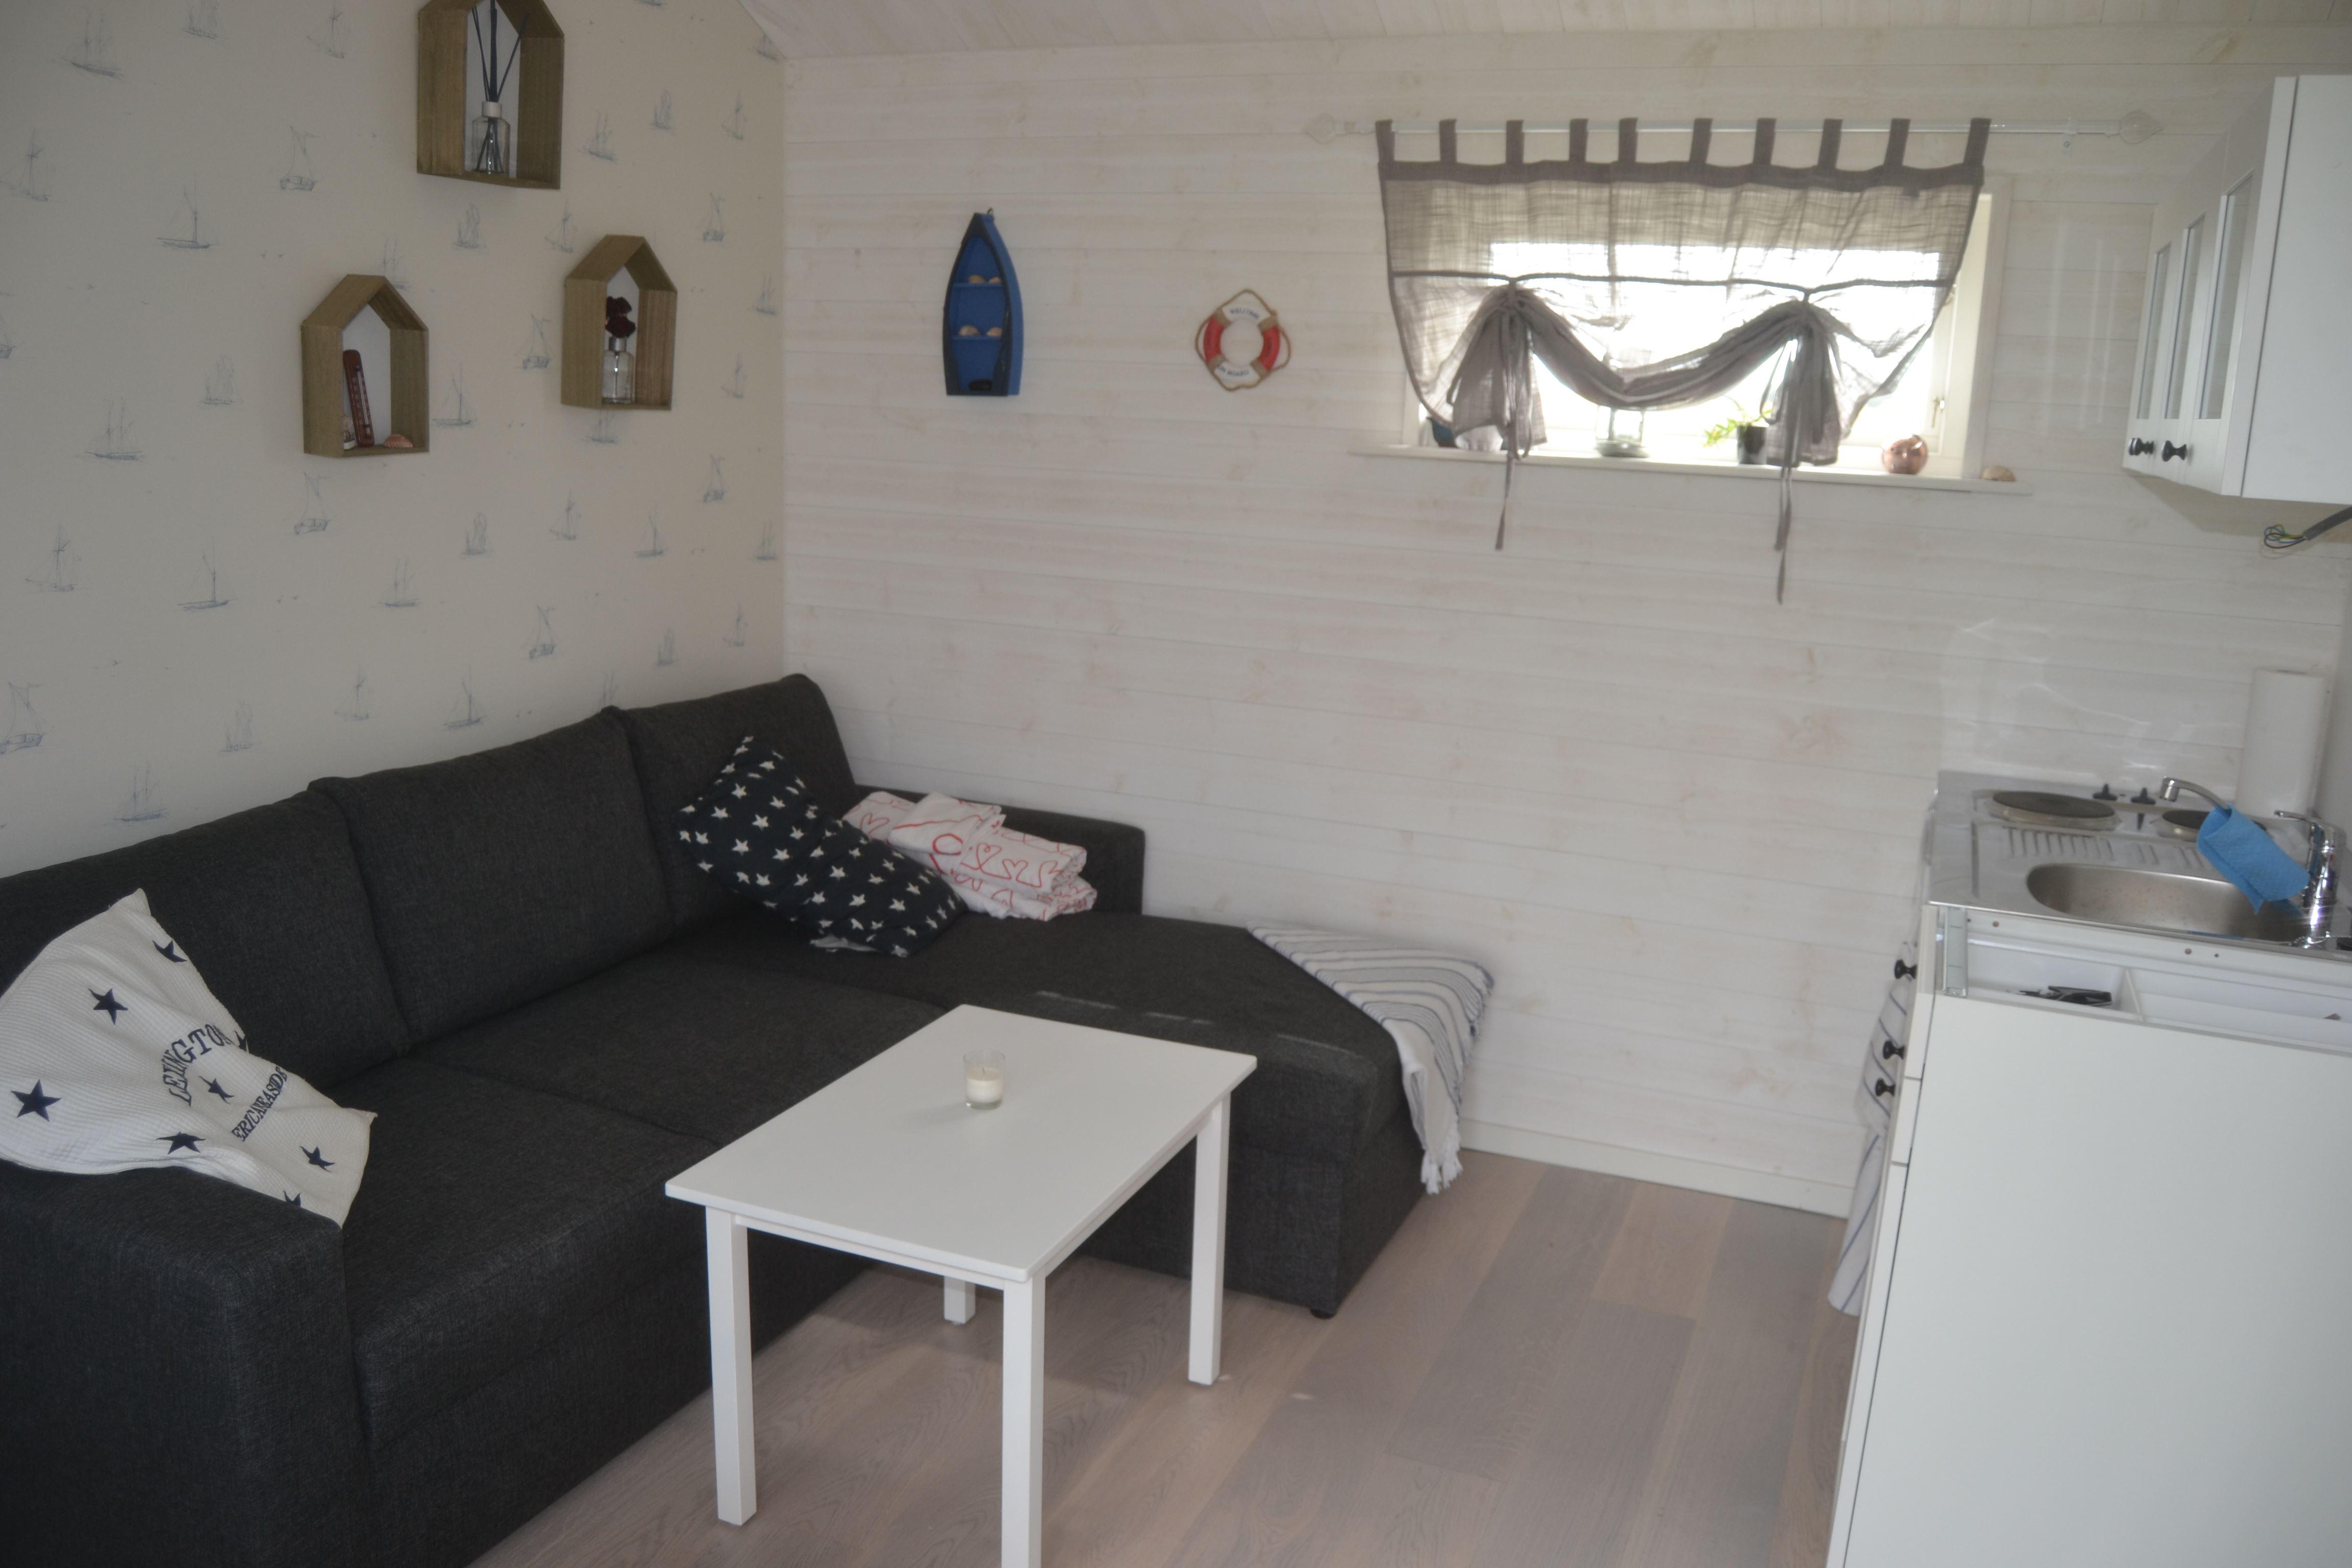 Gästhus i Gislövs Läge